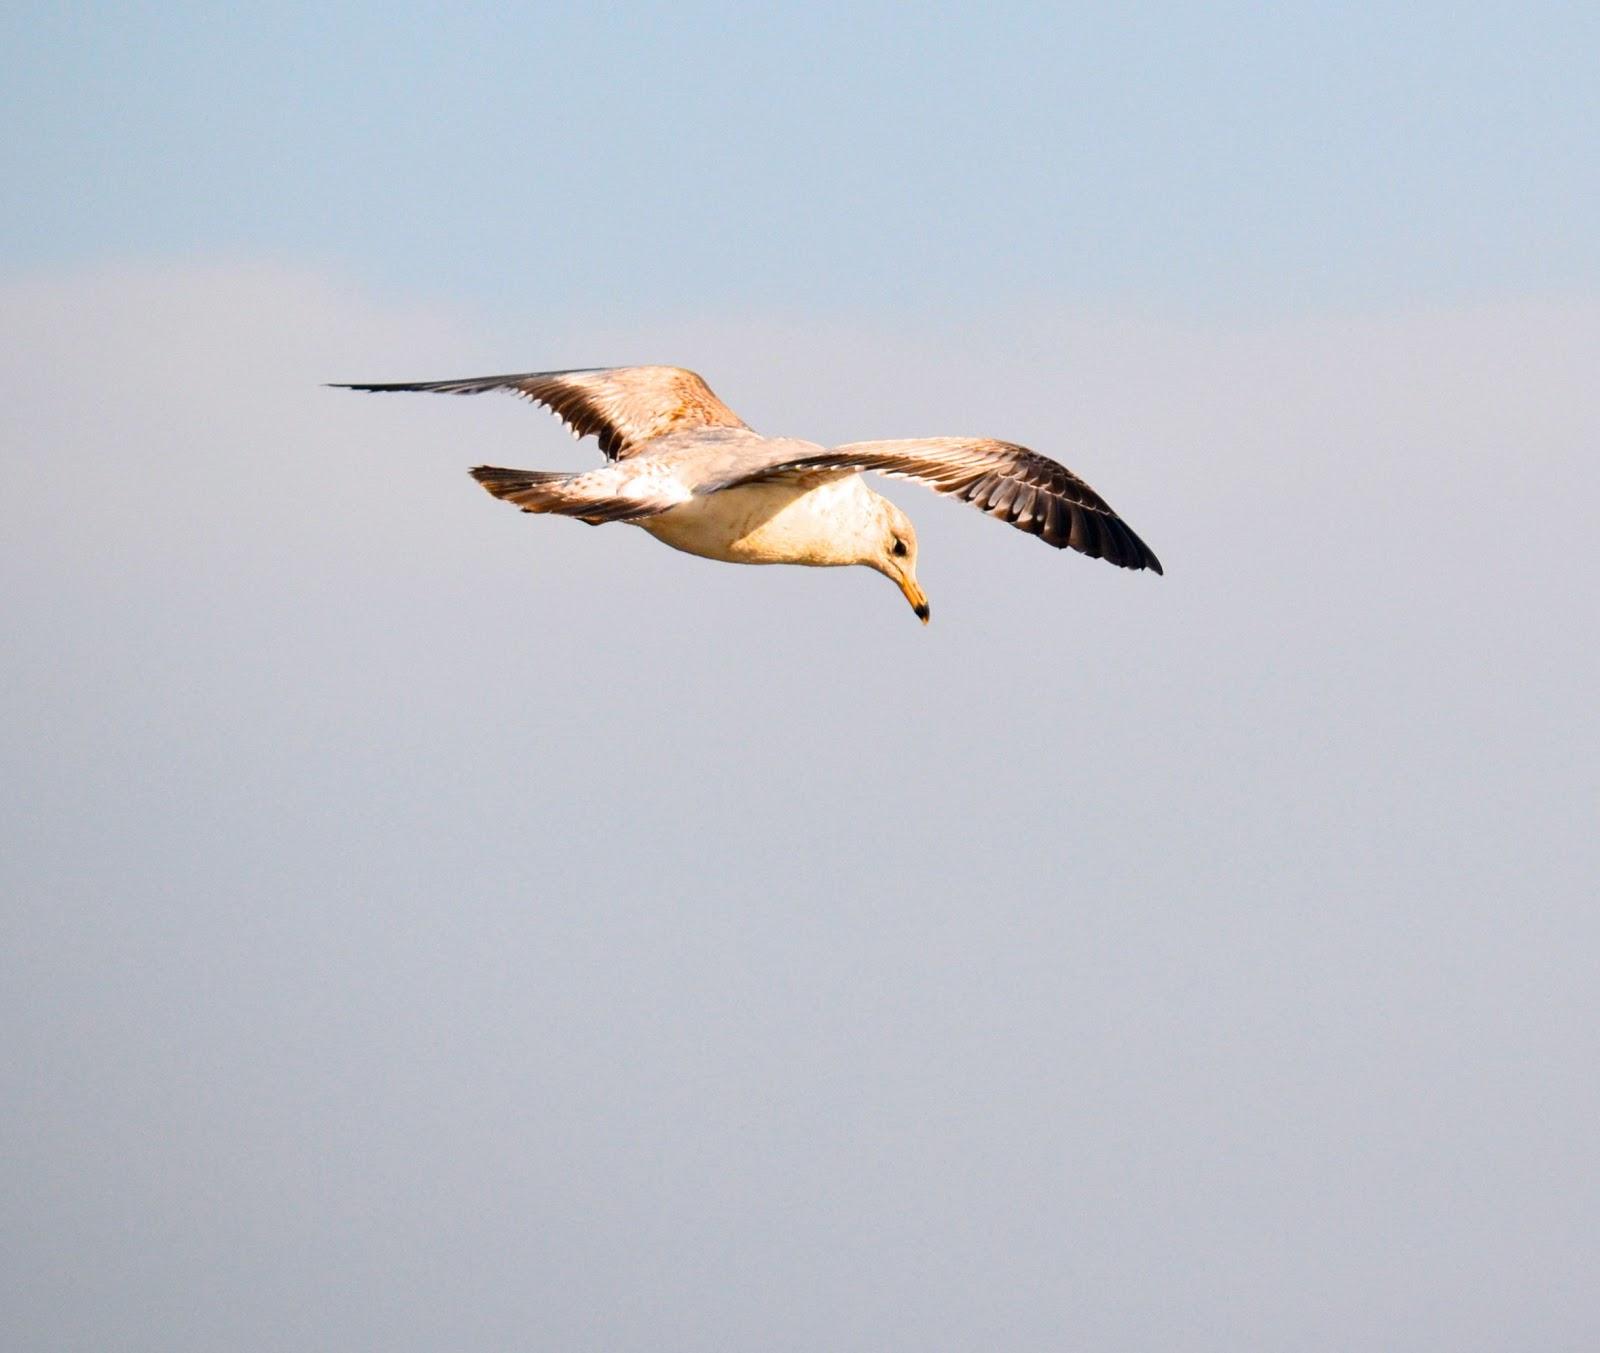 A SCRAPBOOK OF INSPIRATION: Cape Cod Inspiration